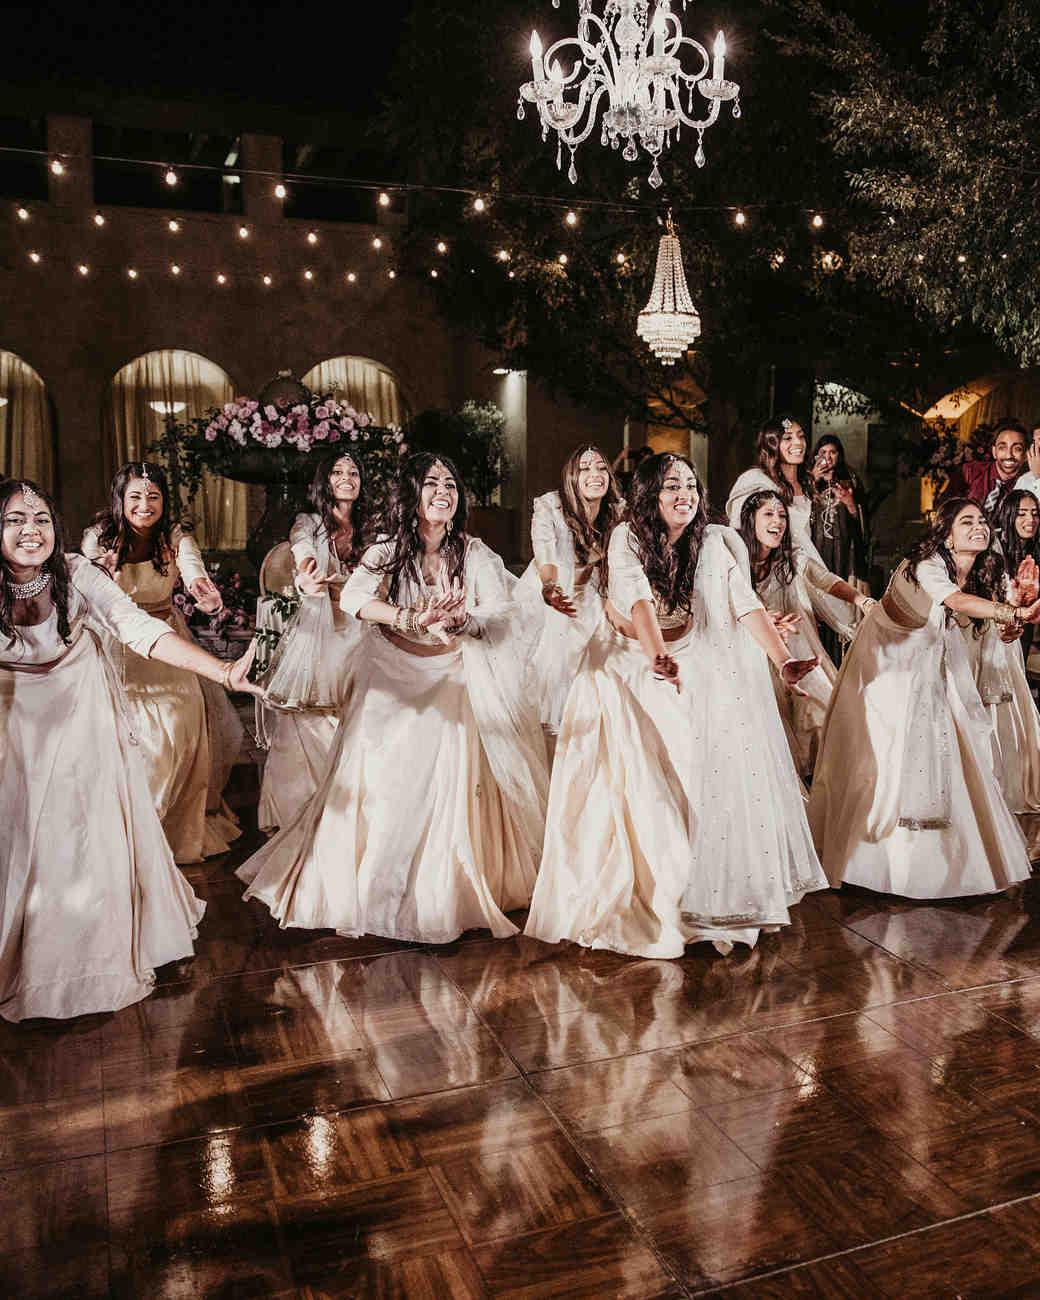 wedding reception bridesmaids choreographed dance